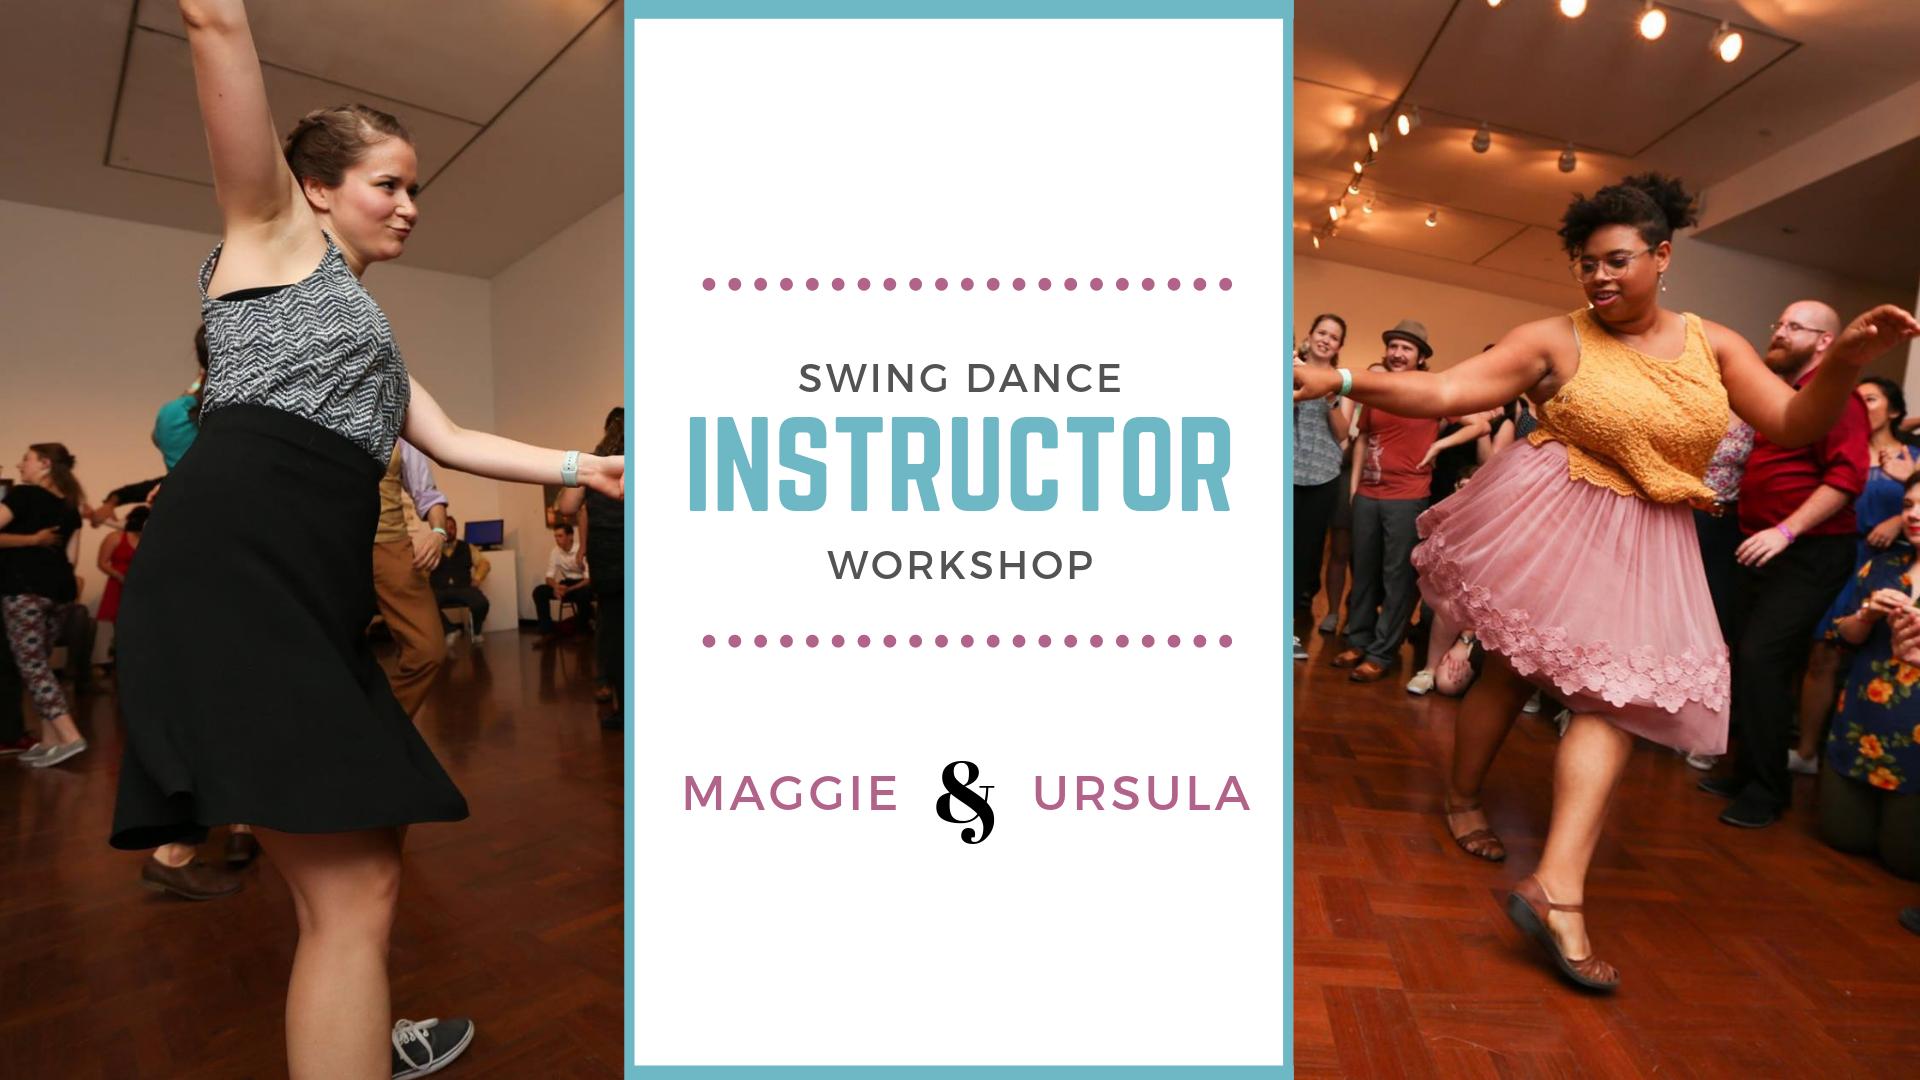 Swing Dance Instructor Workshop